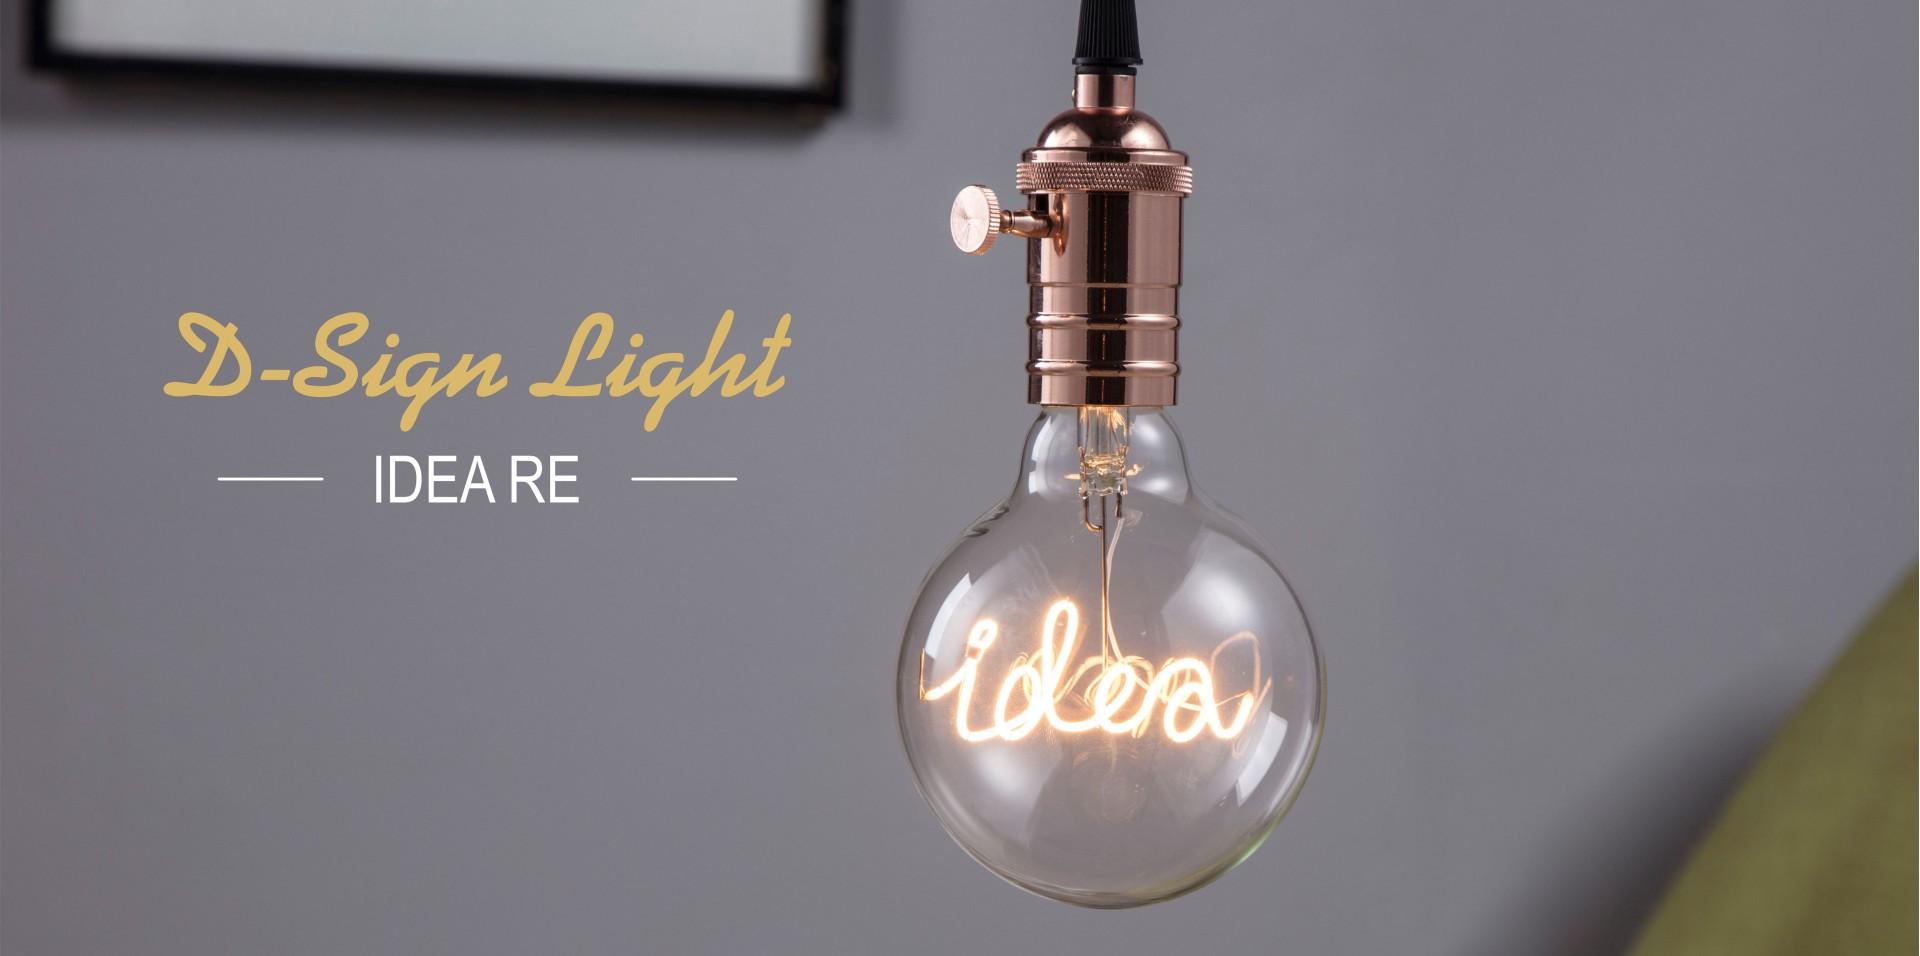 D-Sign Light - Idea Re LED Bulb